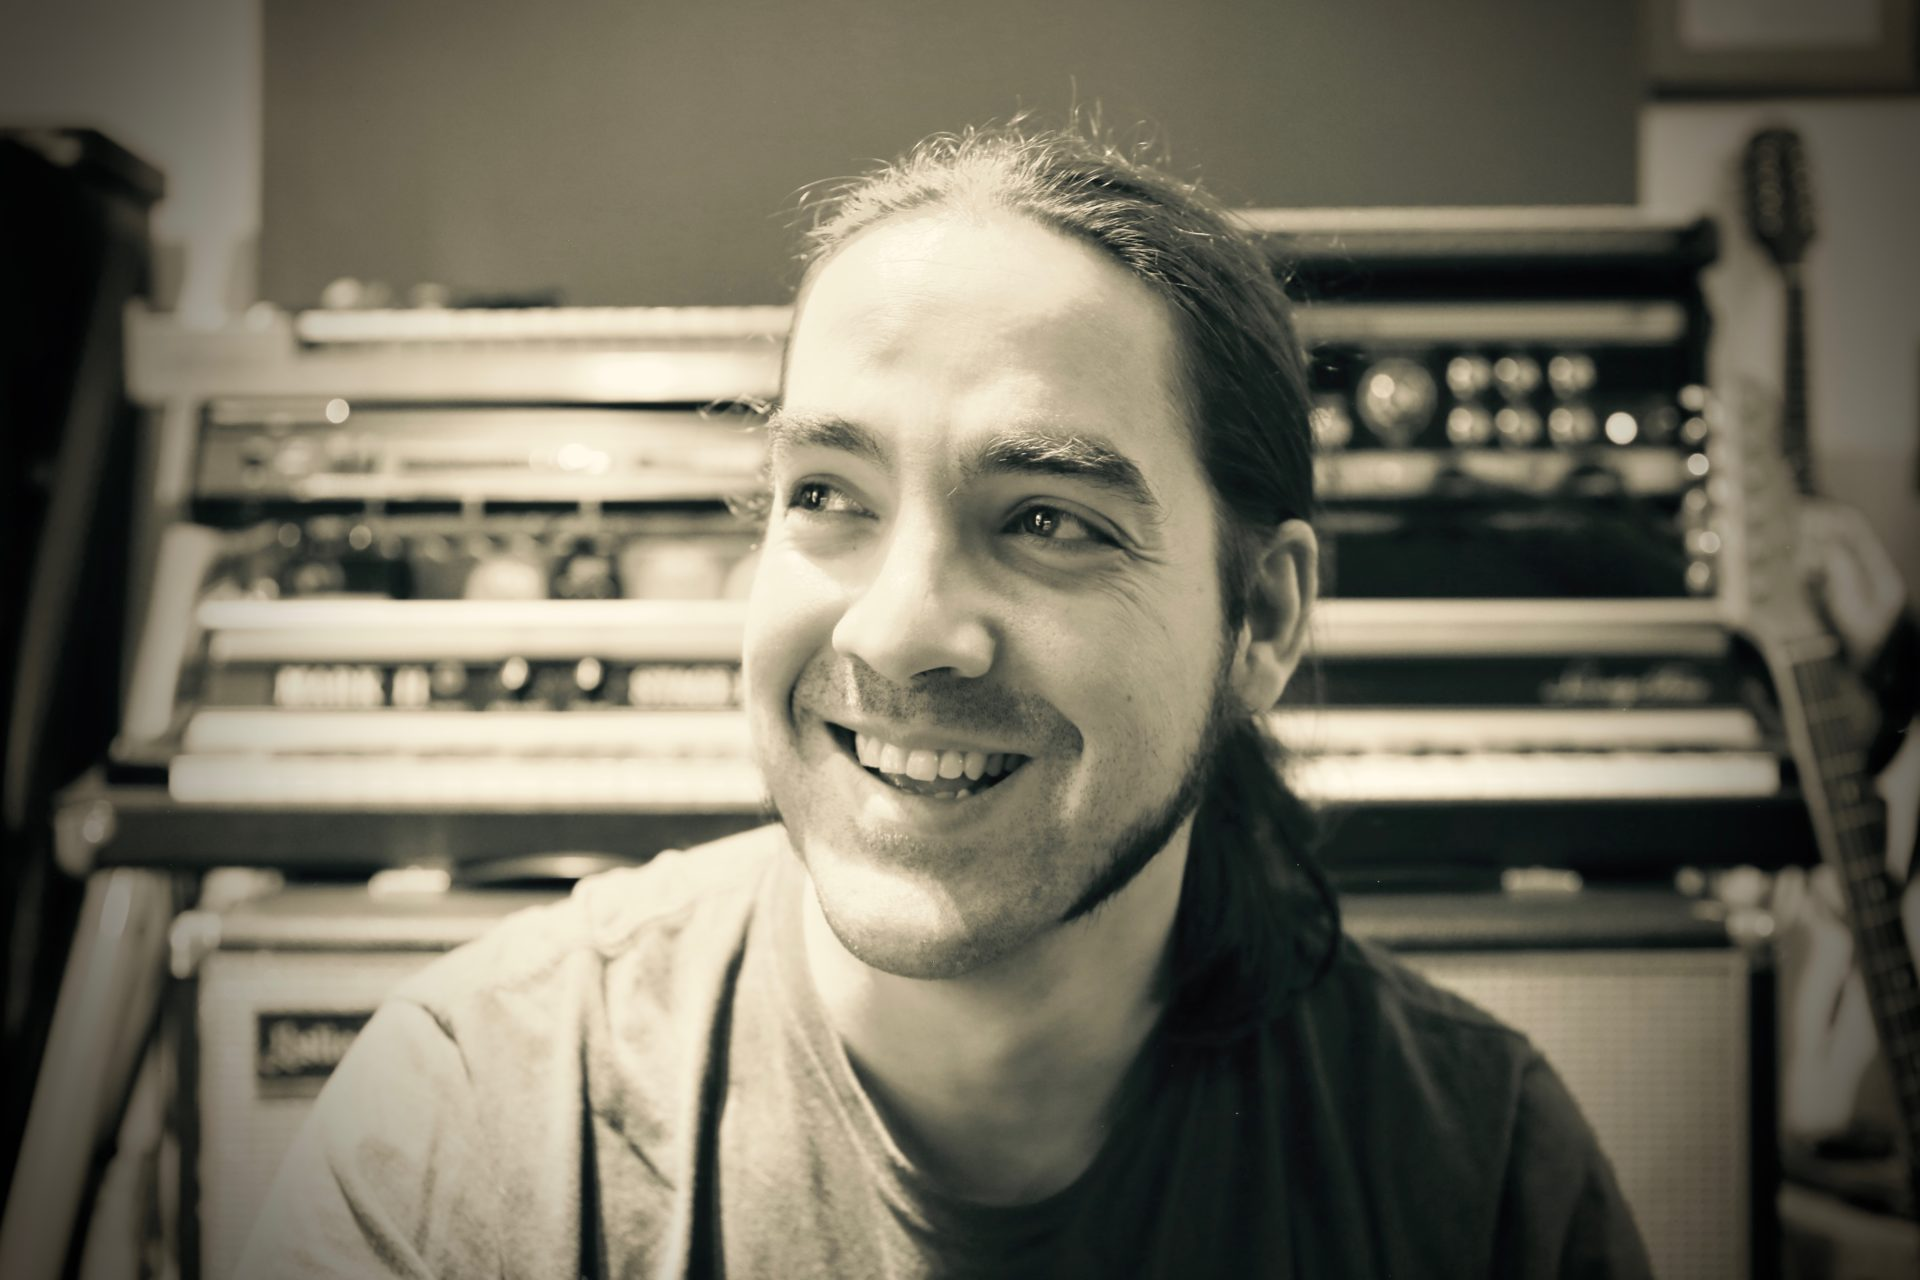 mario vaira - composer & songsmith | i write and produce music for a